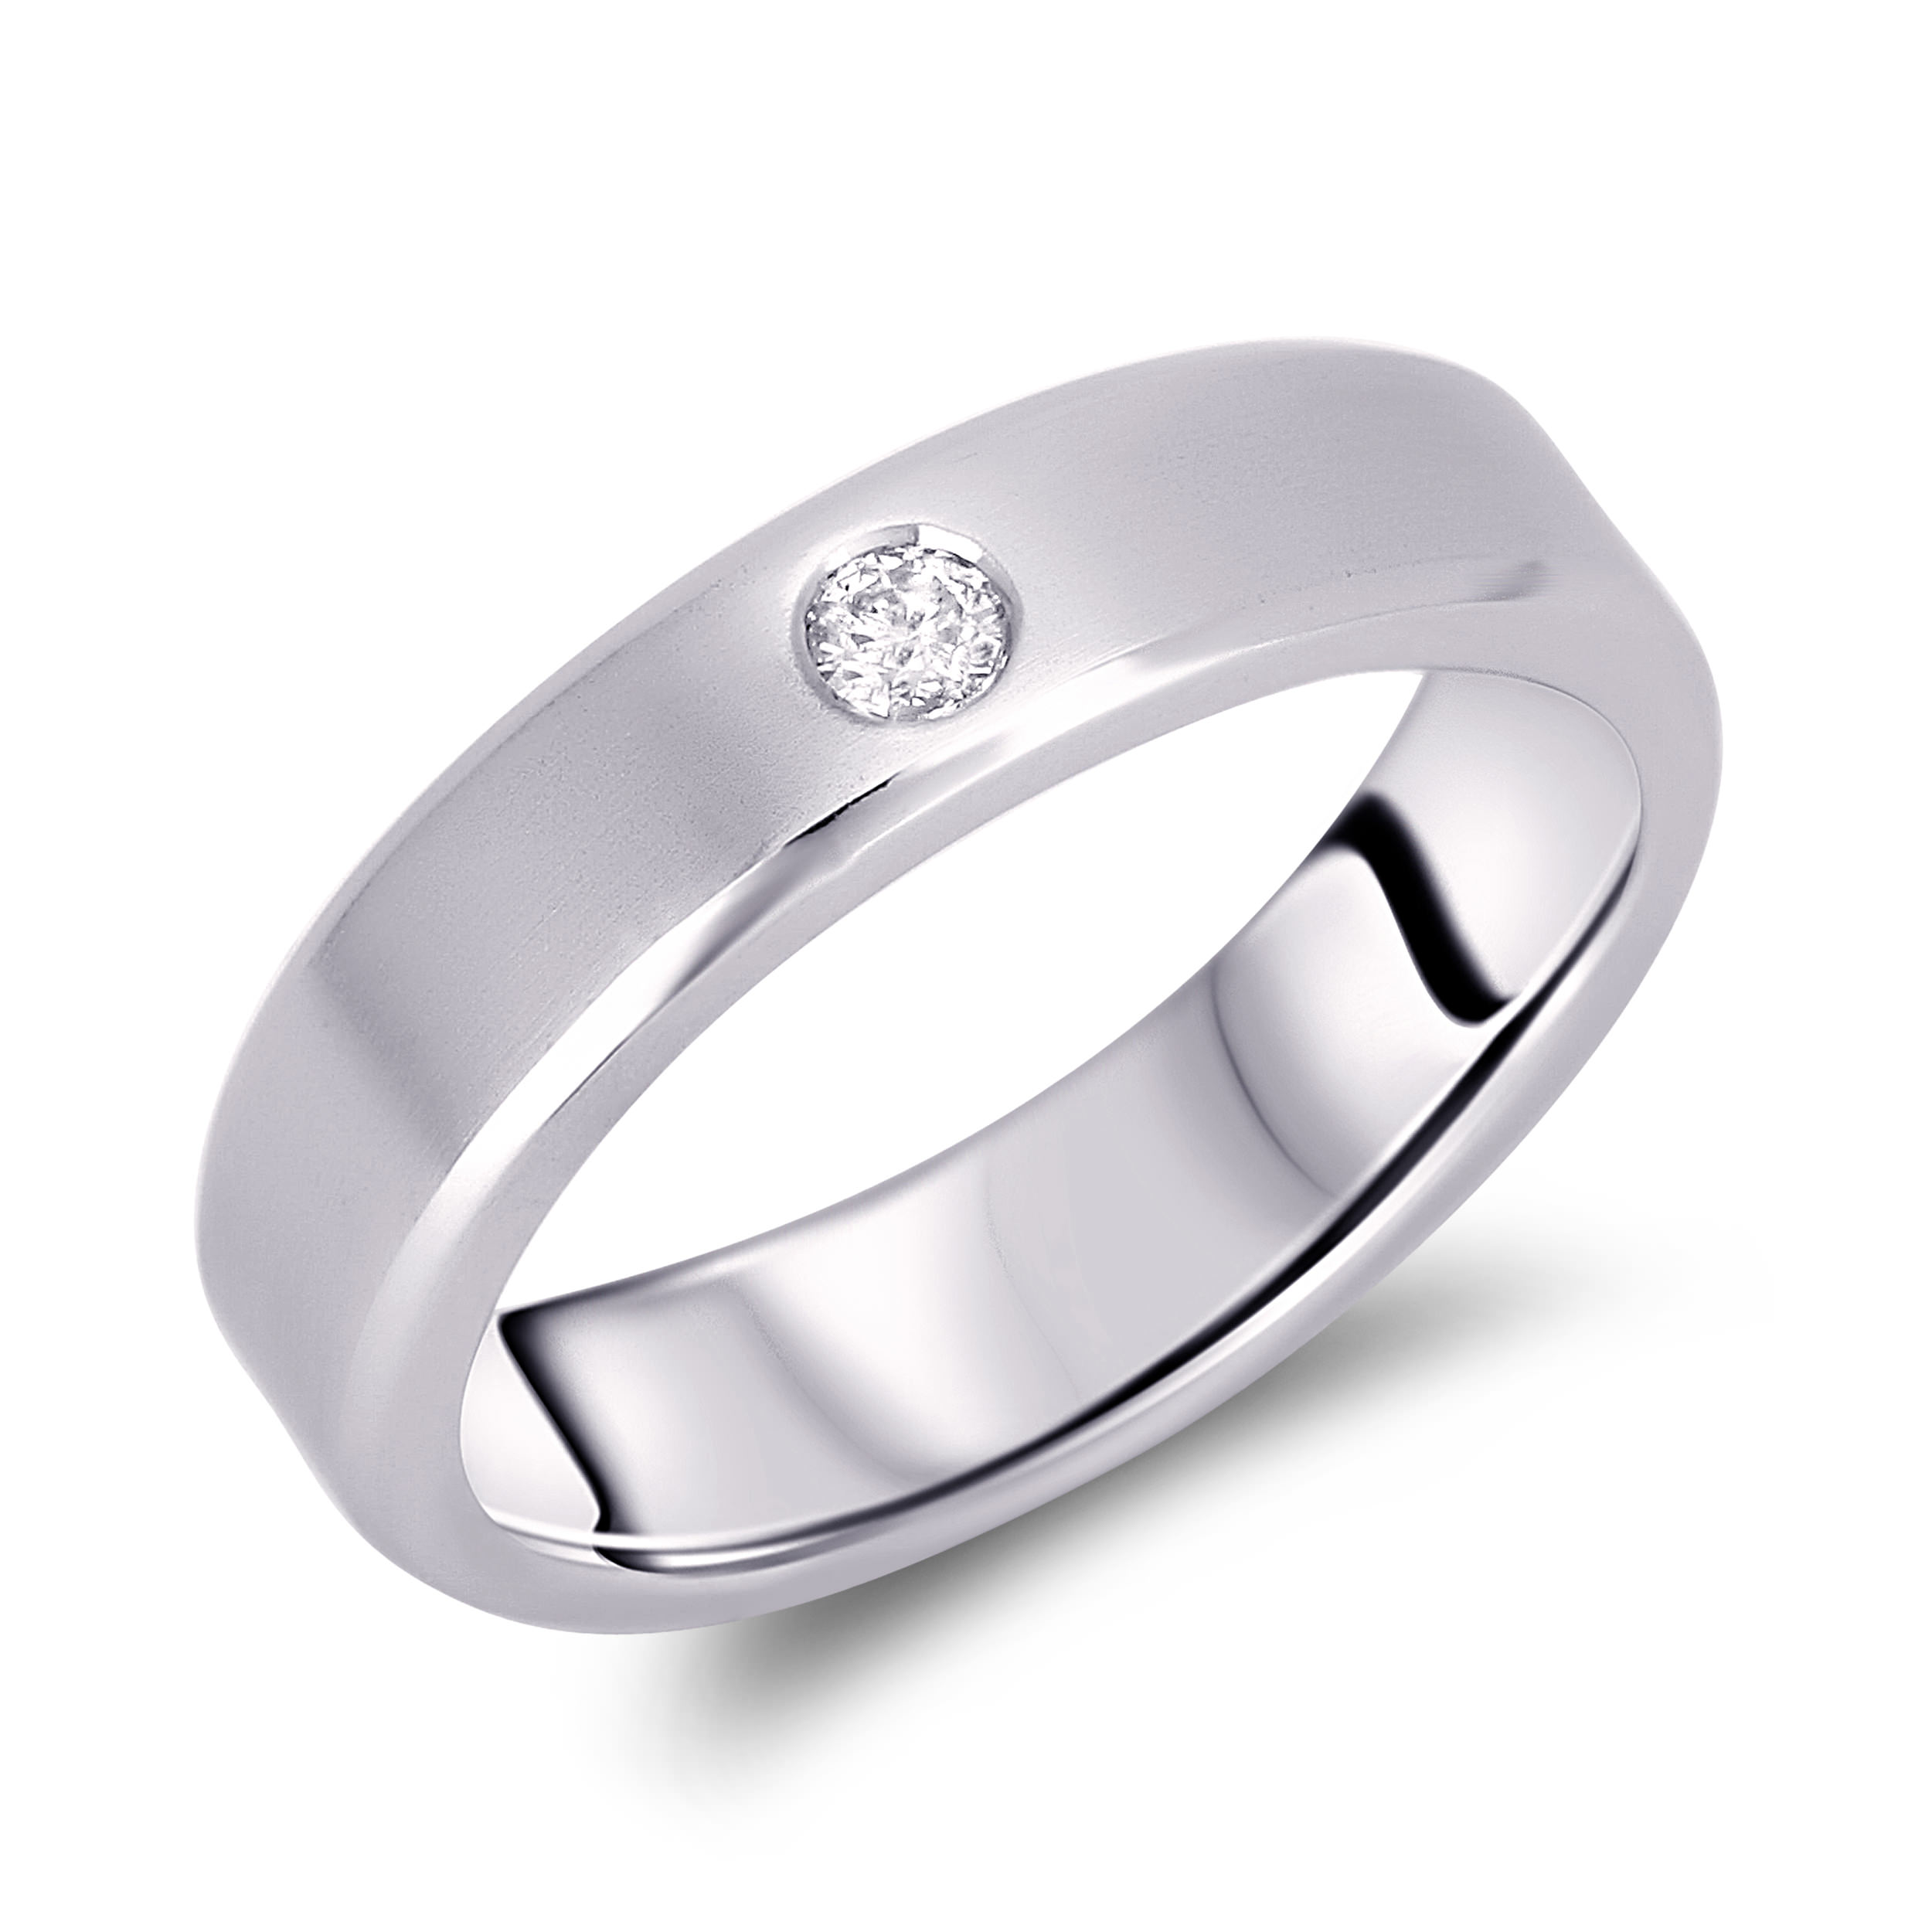 Diamond Gent's Rings SGR592 (Rings)